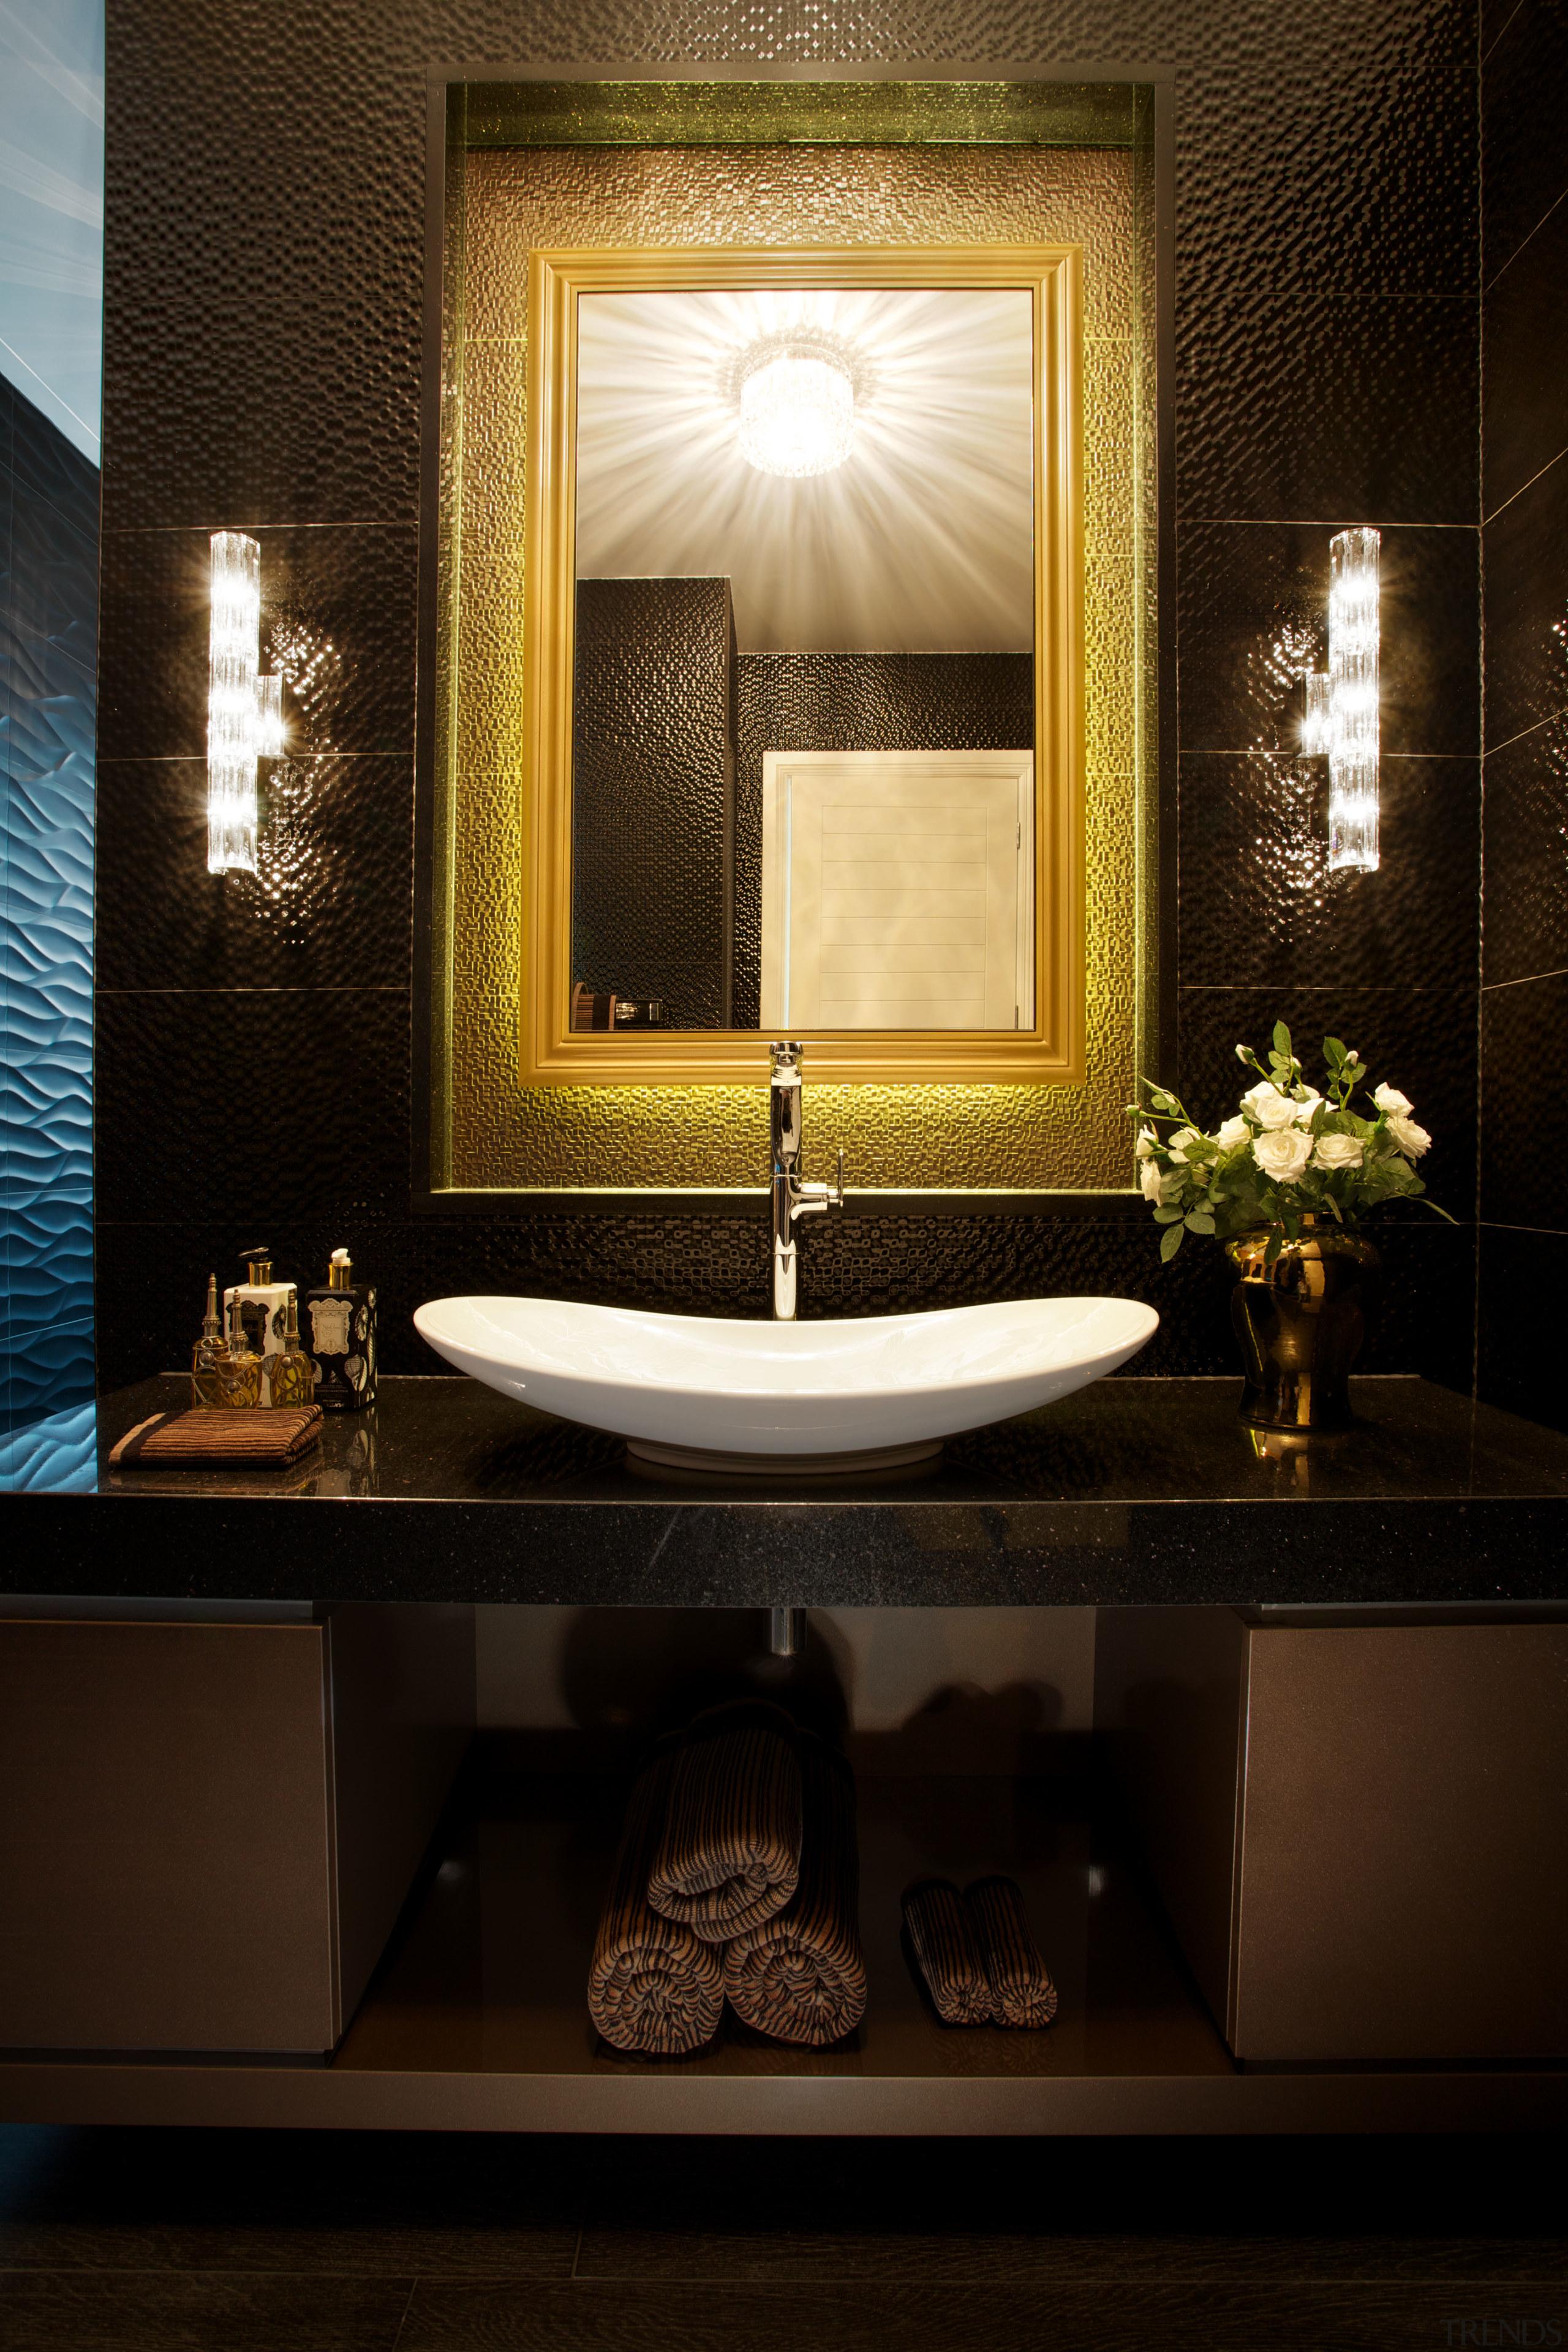 Powder room by architect Henry Lin with gilt-framed bathroom, ceiling, home, interior design, lighting, room, window, brown, black